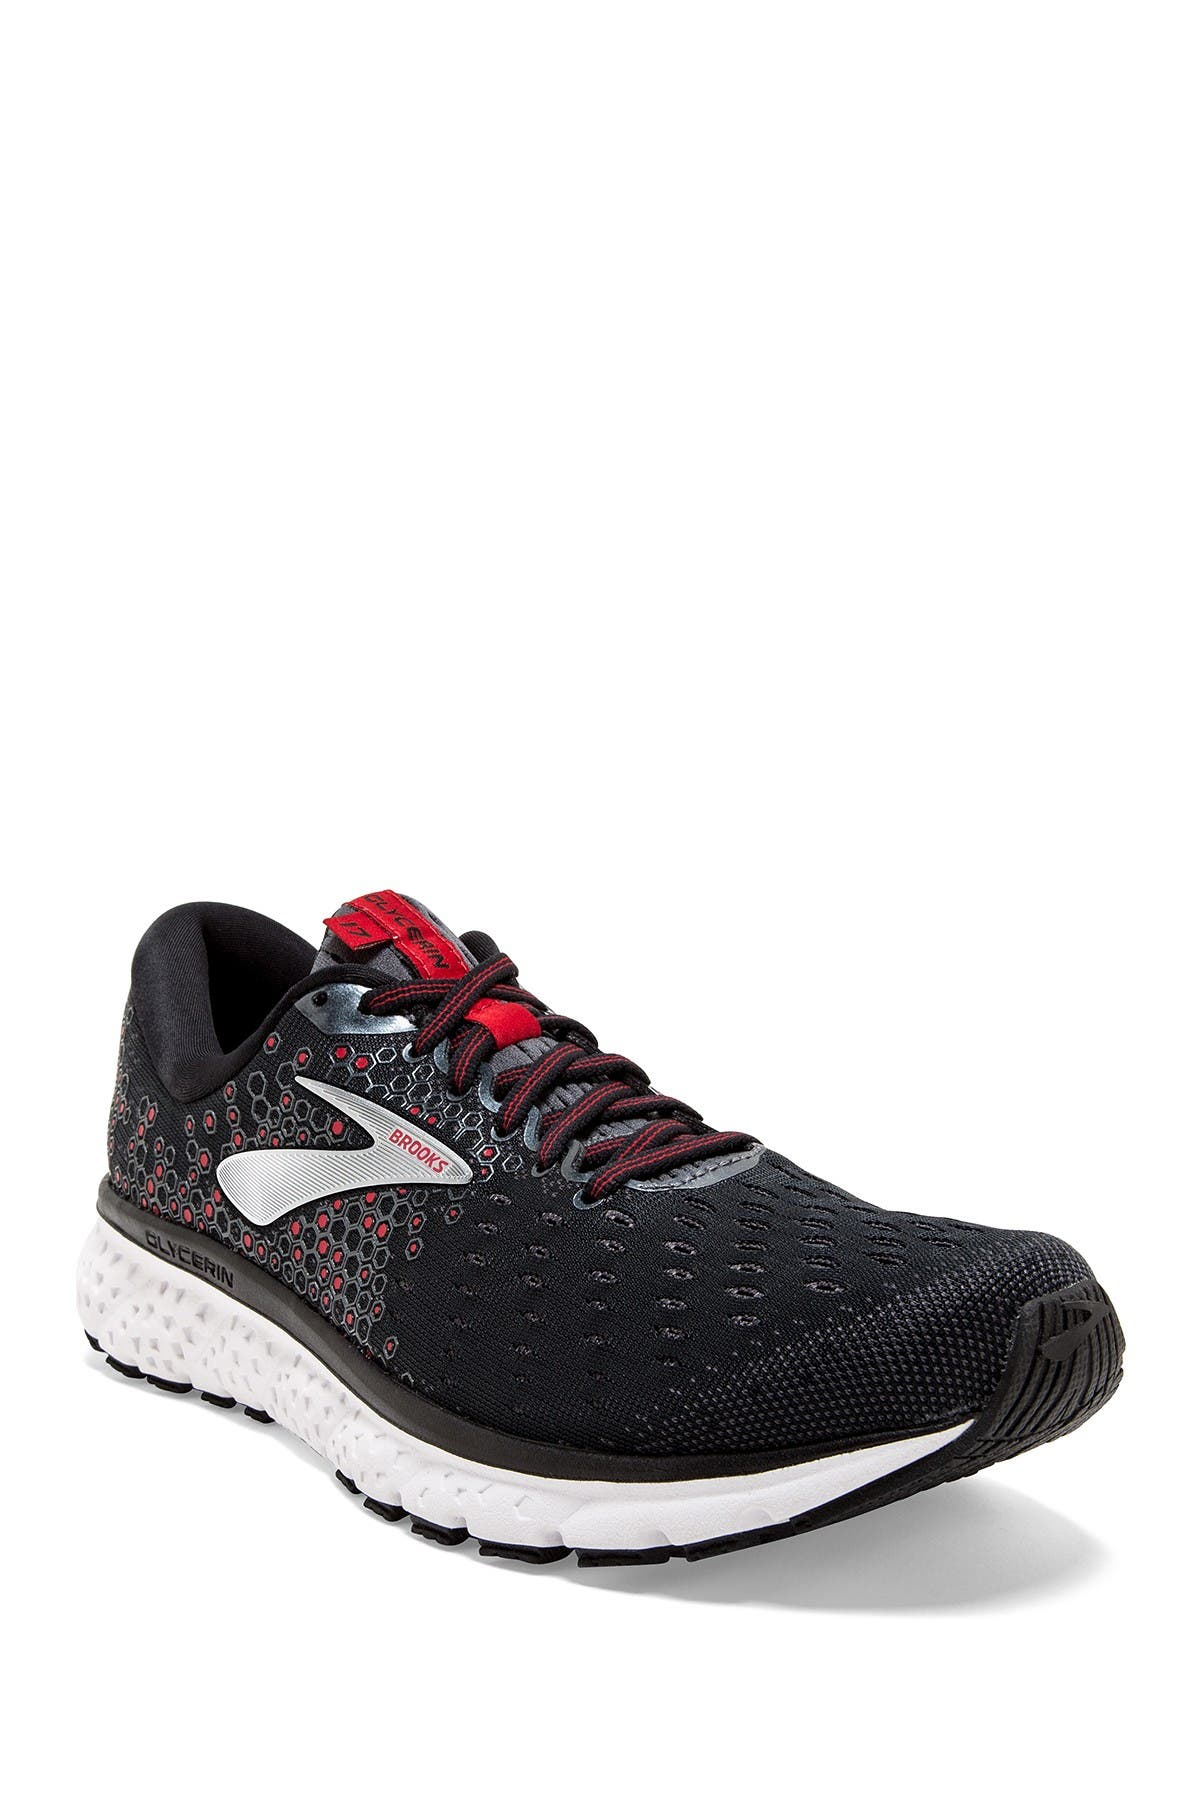 Brooks | Glycerin 17 Running Shoe